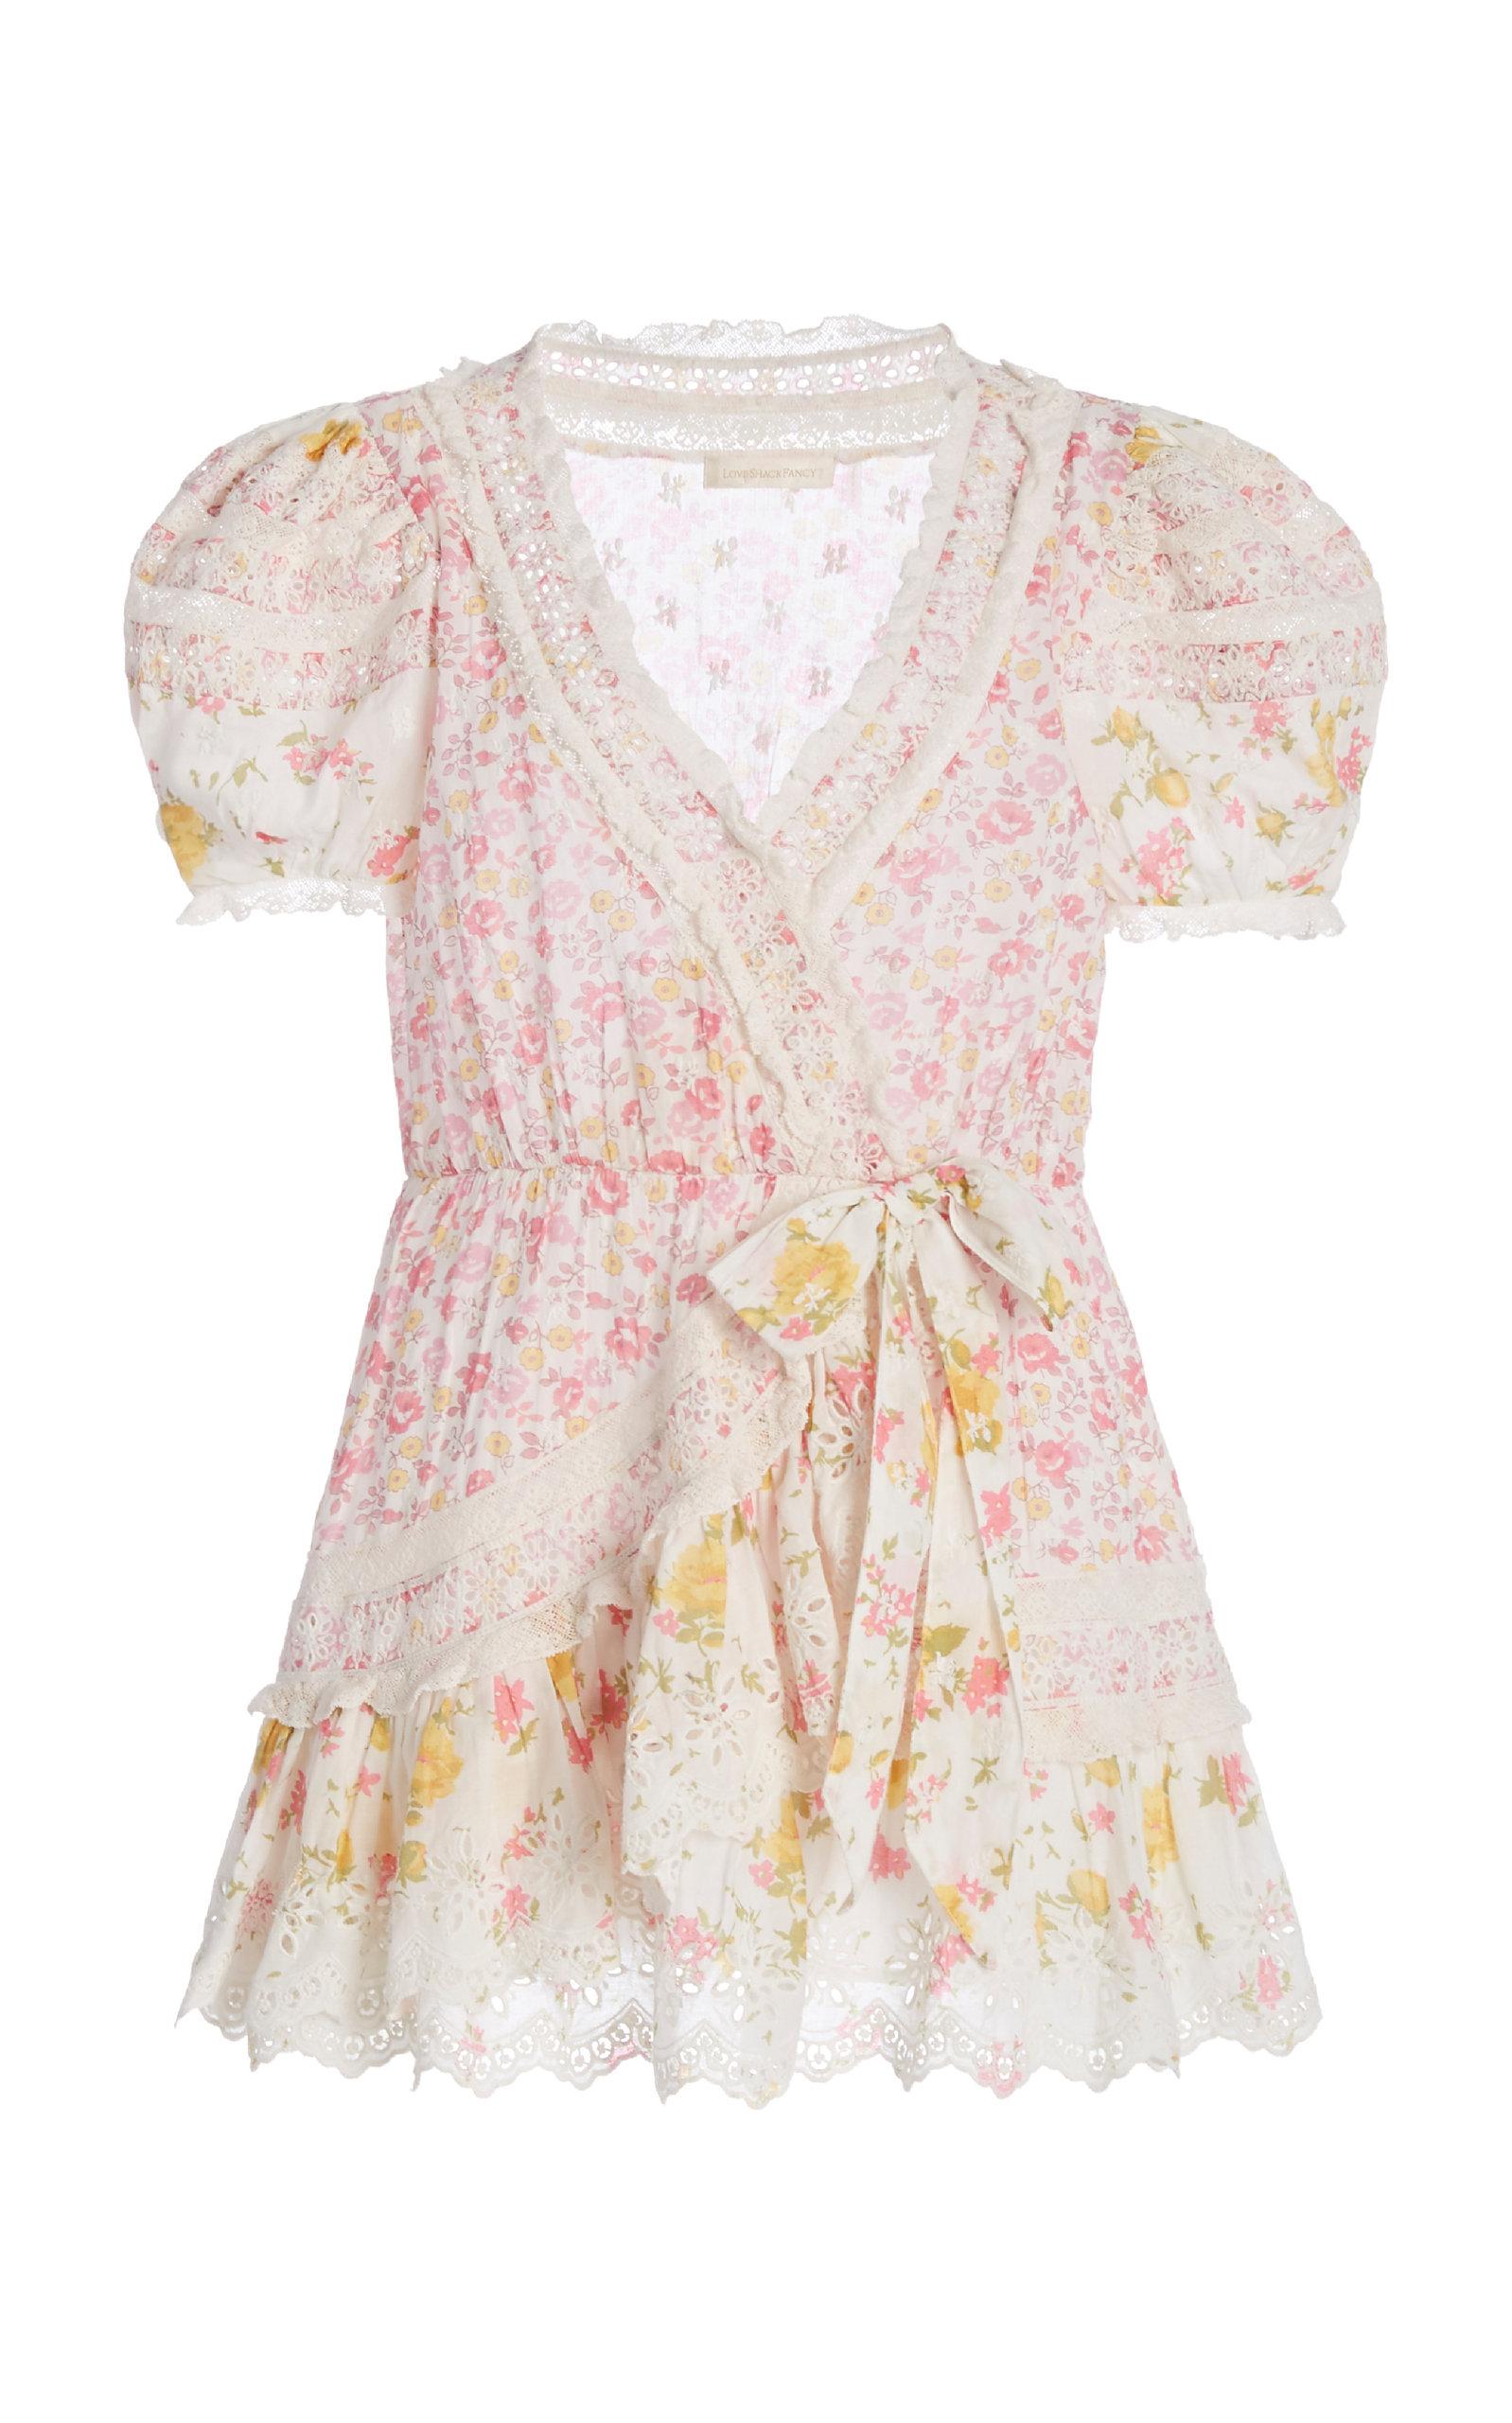 Buy LoveShackFancy Belen Patchwork Floral Cotton Wrap Mini Dress online, shop LoveShackFancy at the best price